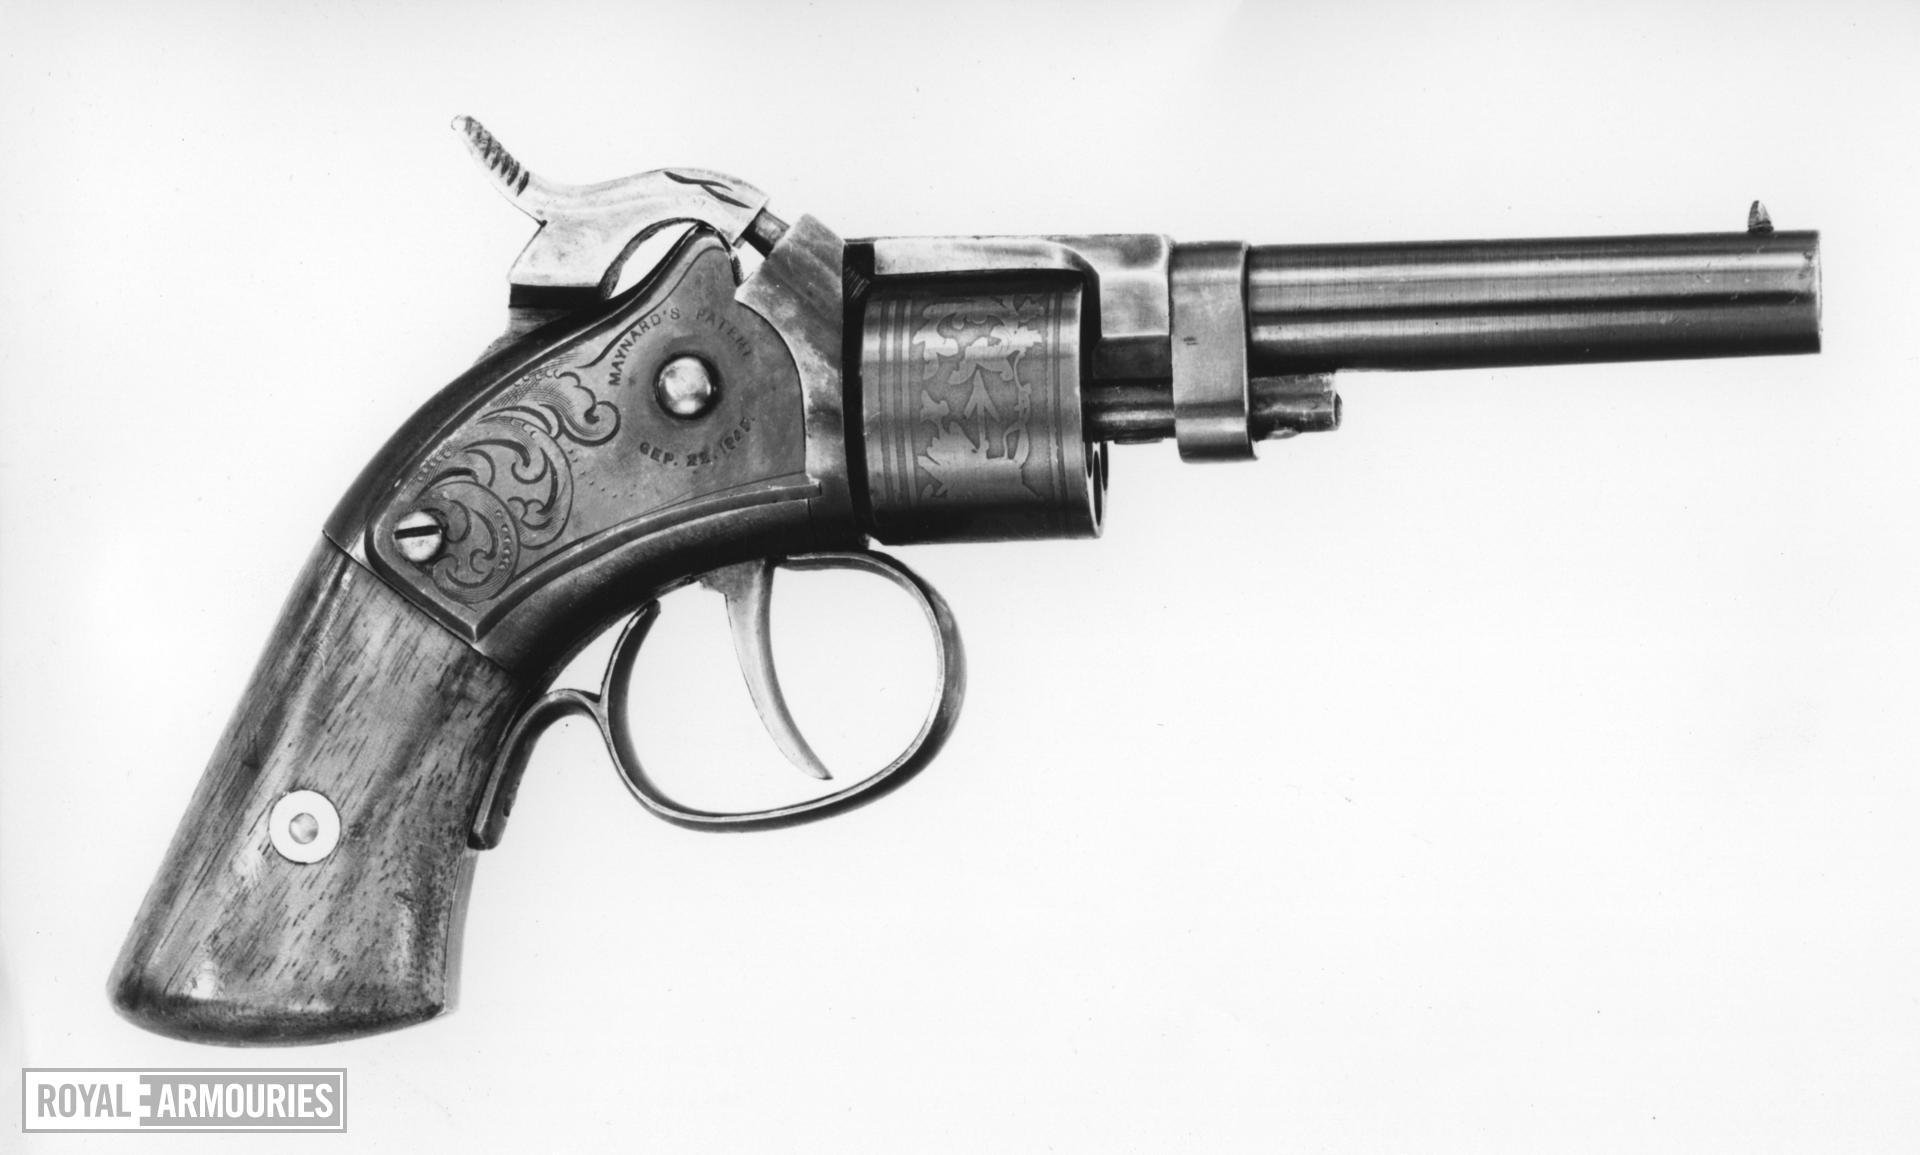 Percussion six-shot revolver - Maynard Patent